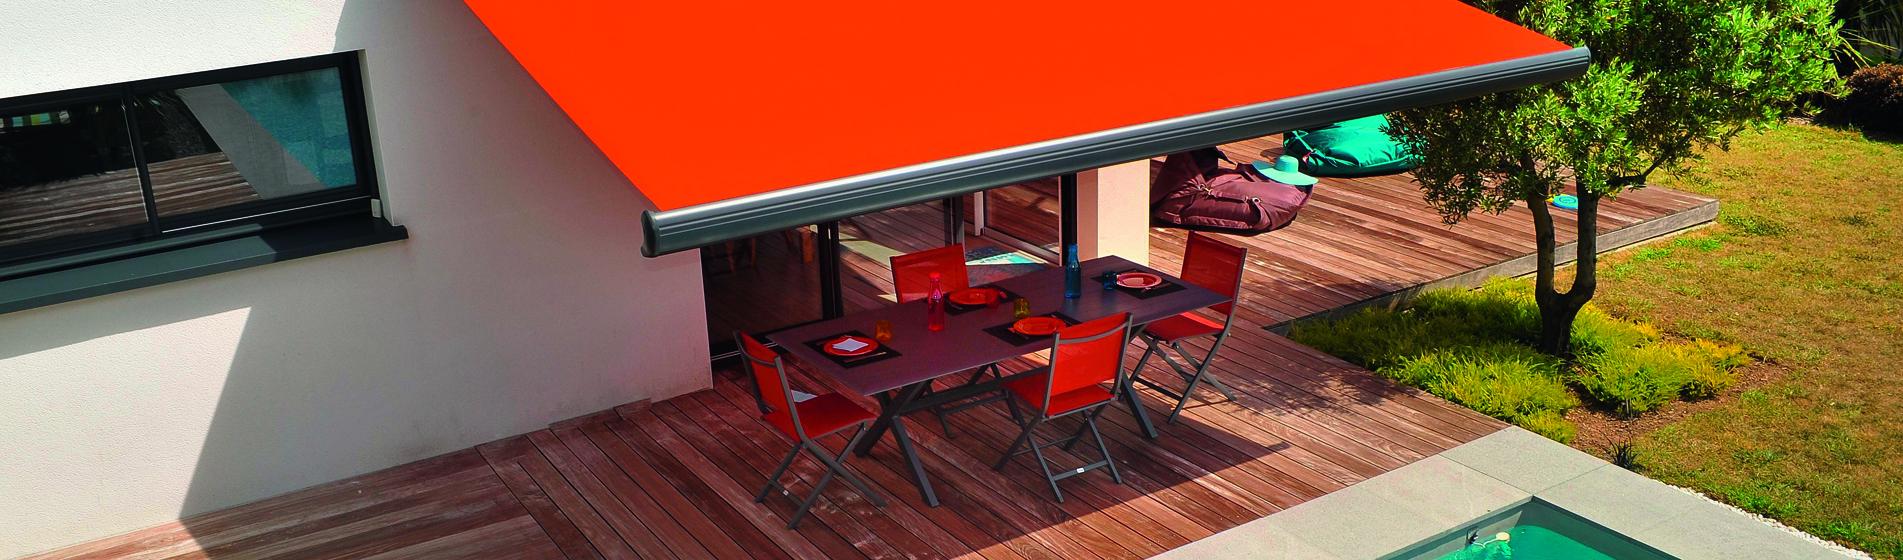 rénovation store banne balcon 30 Gard